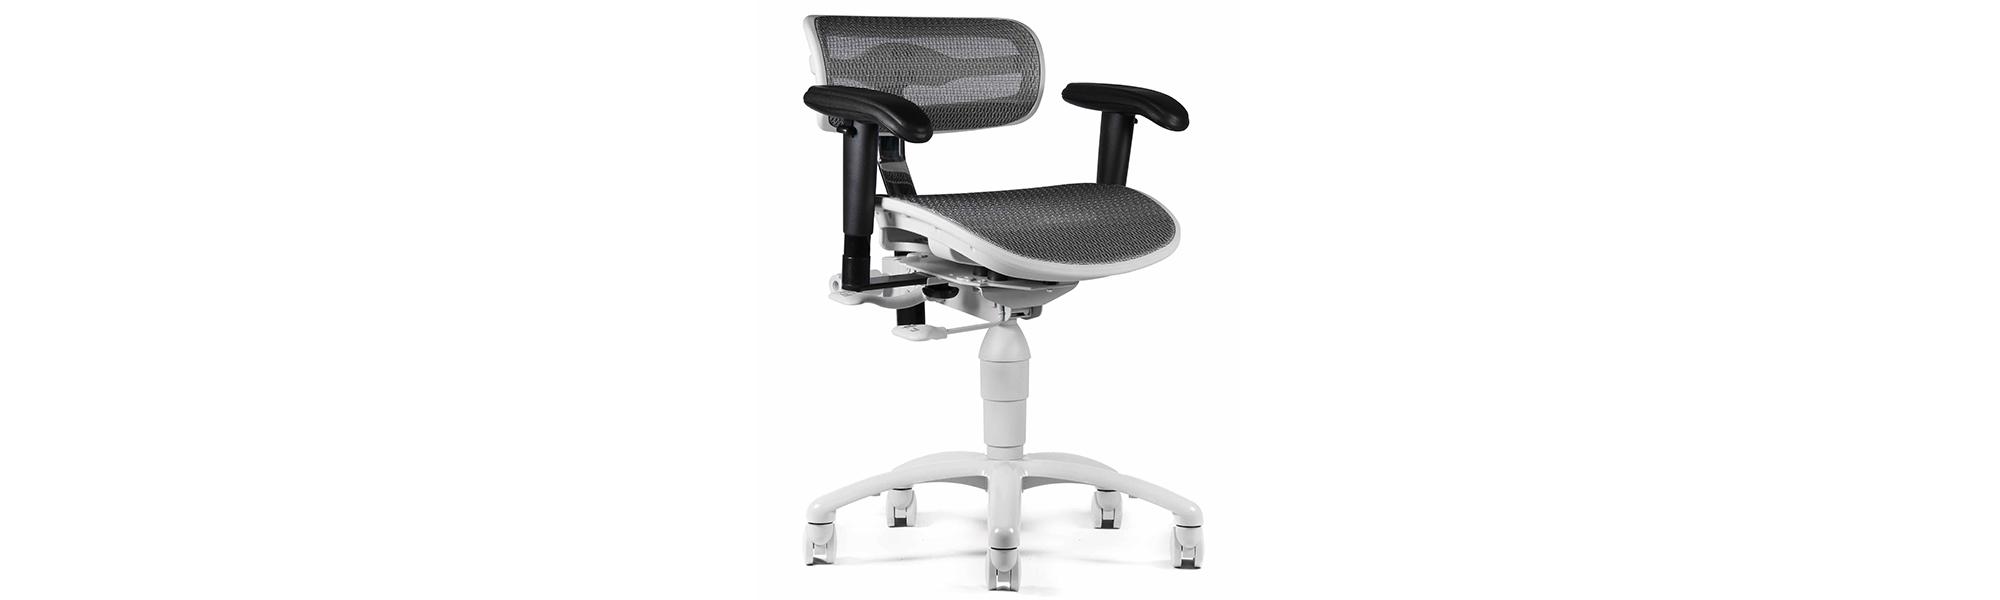 chair porcelein2